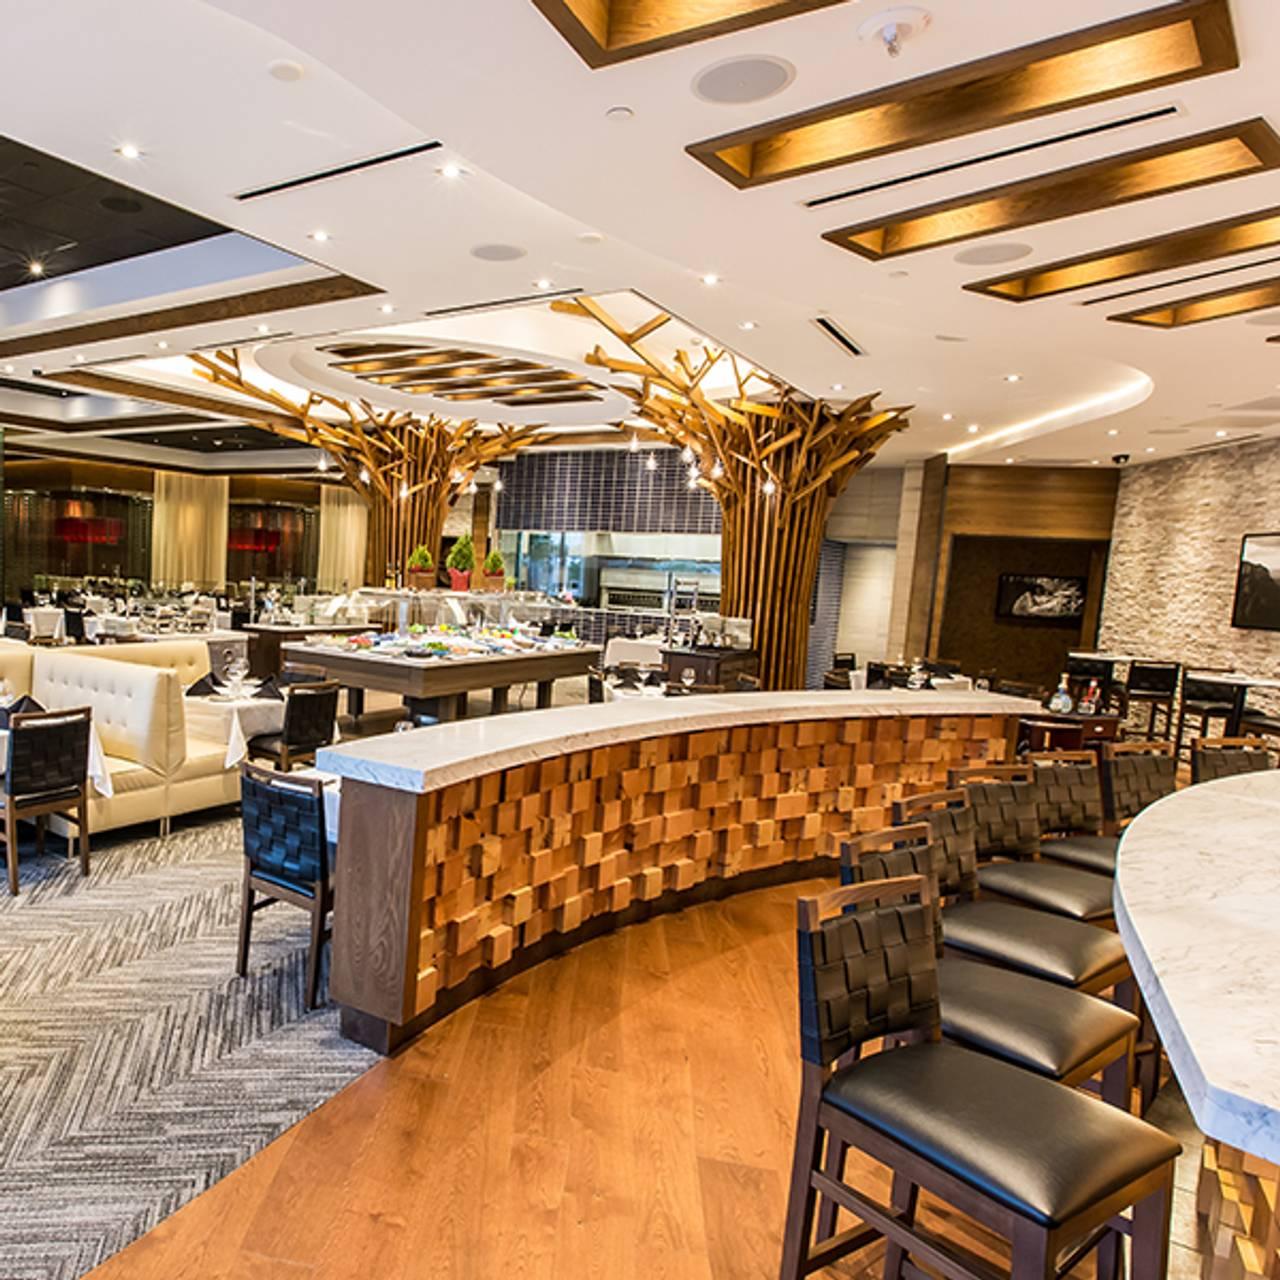 Summerlin Interior Fogo De Chao Brazilian Steakhouse Las Vegas Nv